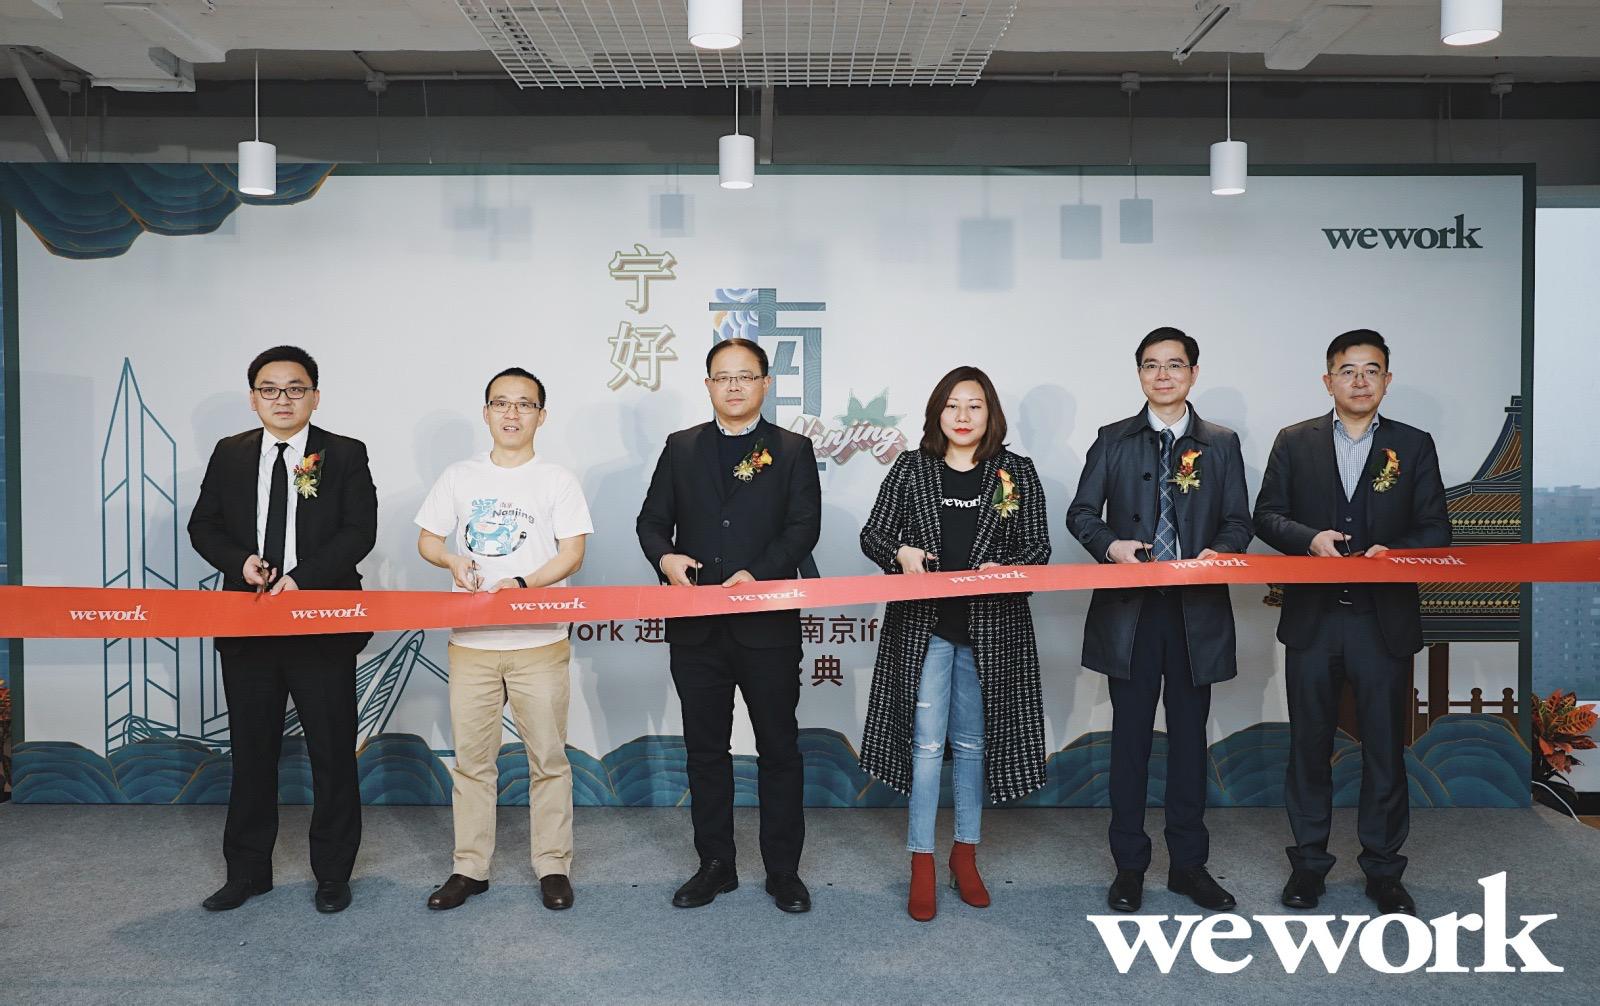 WeWork正式进驻南京,首批社区盛大开幕